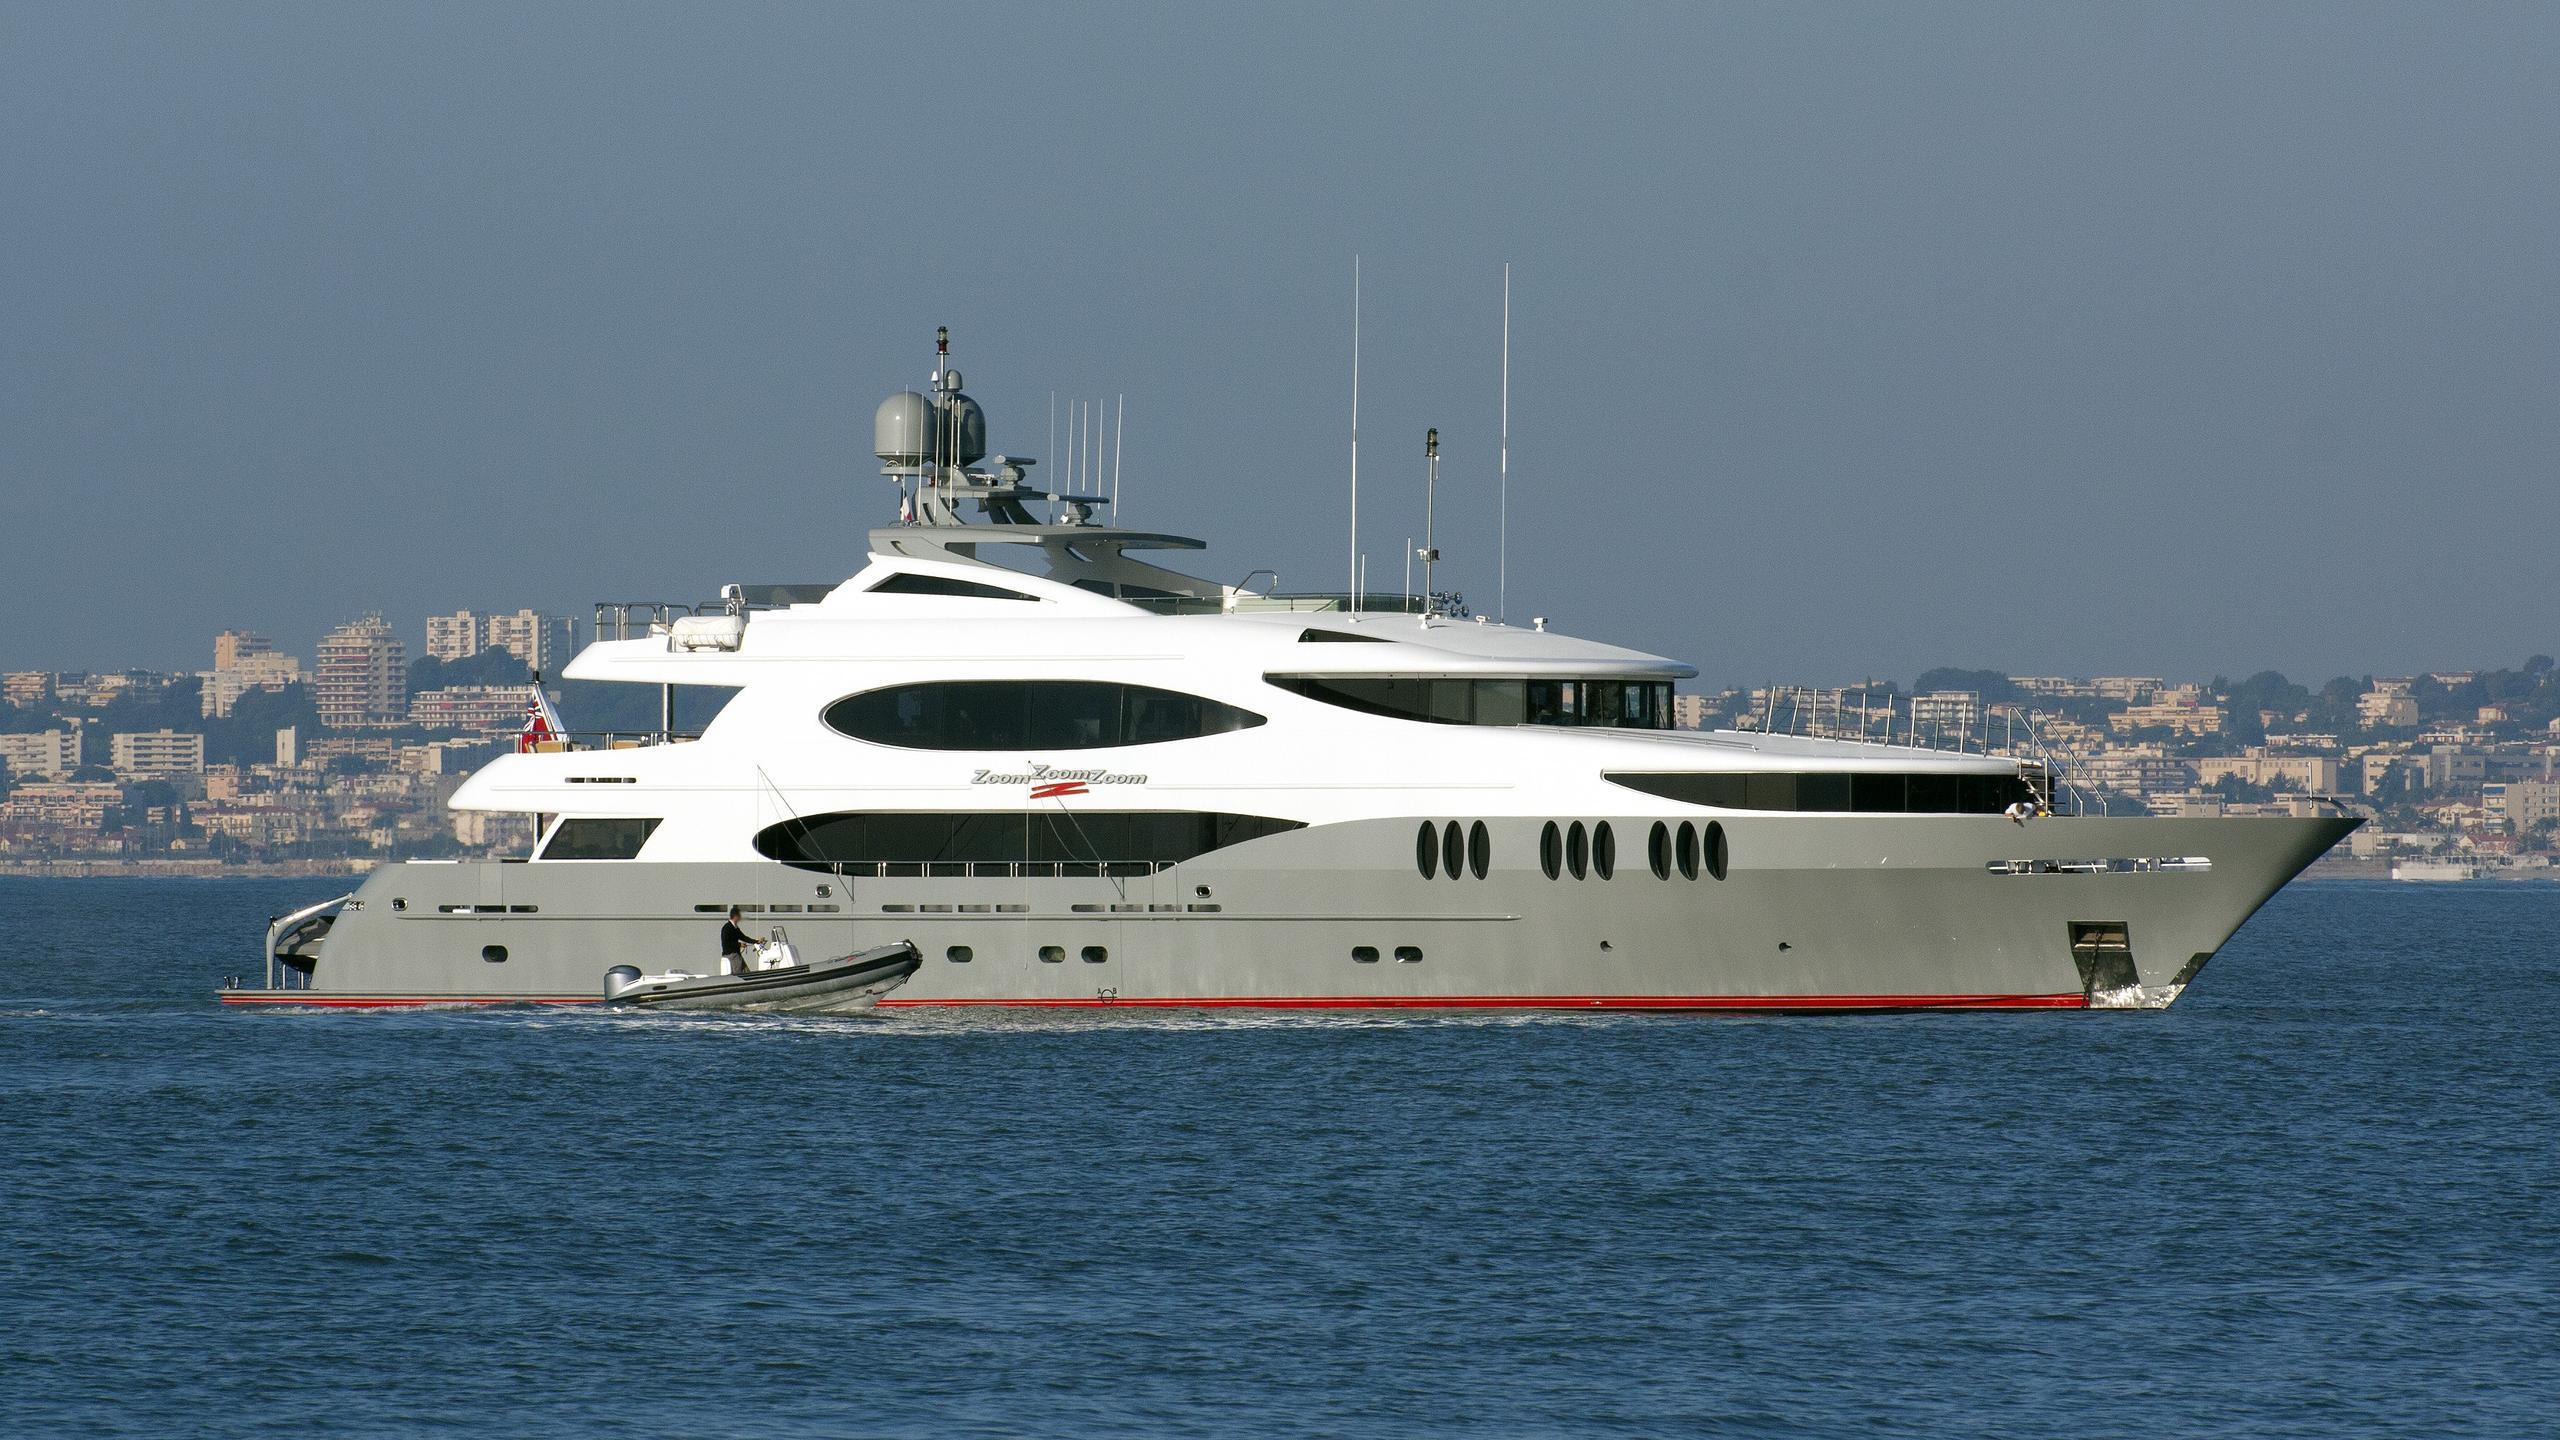 zoom-zoom-zoom-2015-yacht-exterior